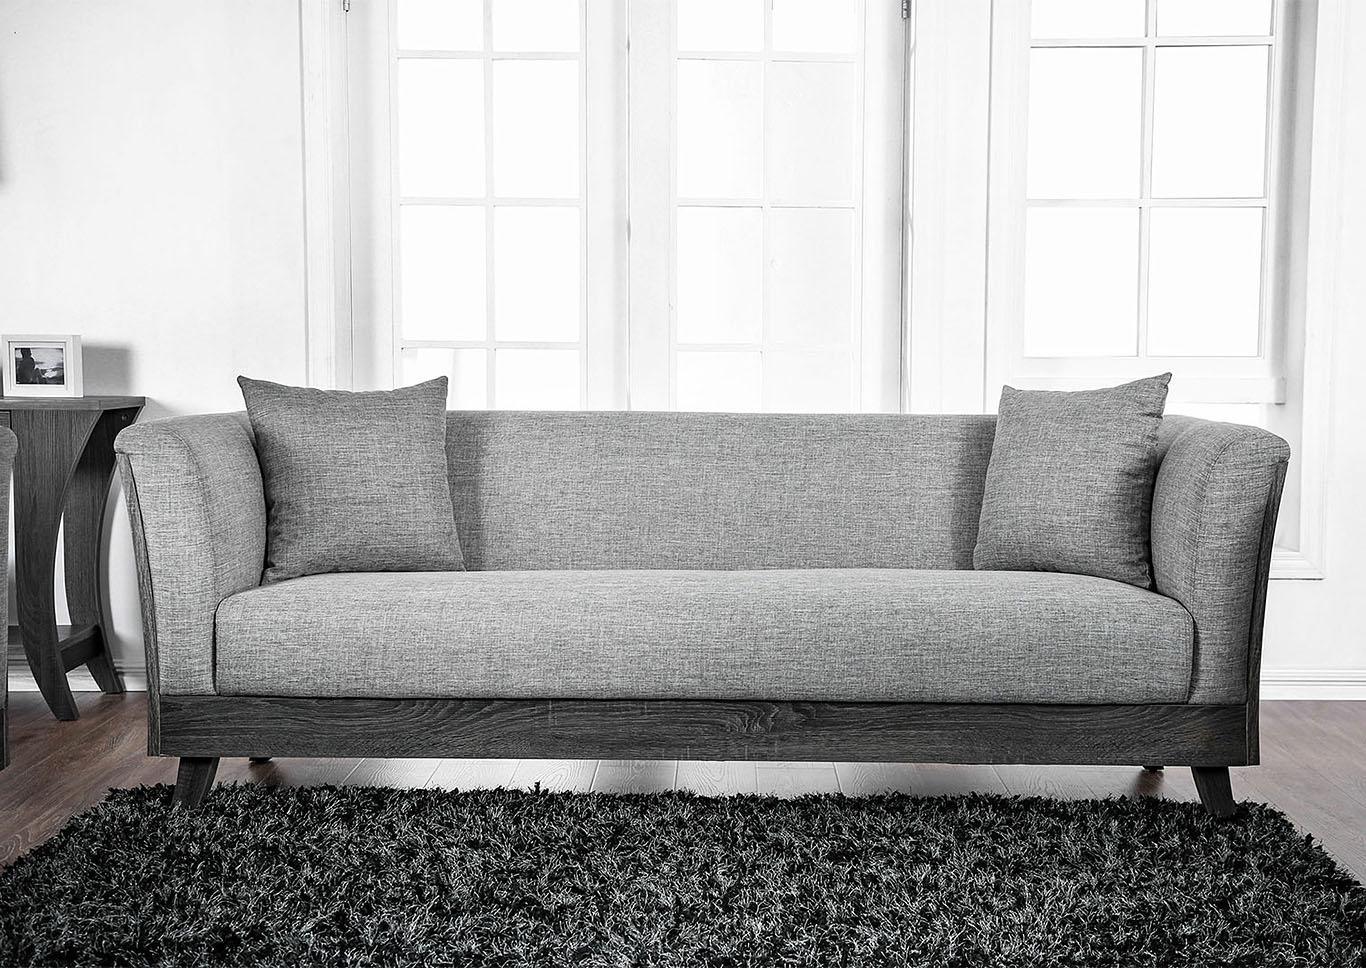 Pleasing Gabys Furniture Cailin Gray Sofa Bralicious Painted Fabric Chair Ideas Braliciousco